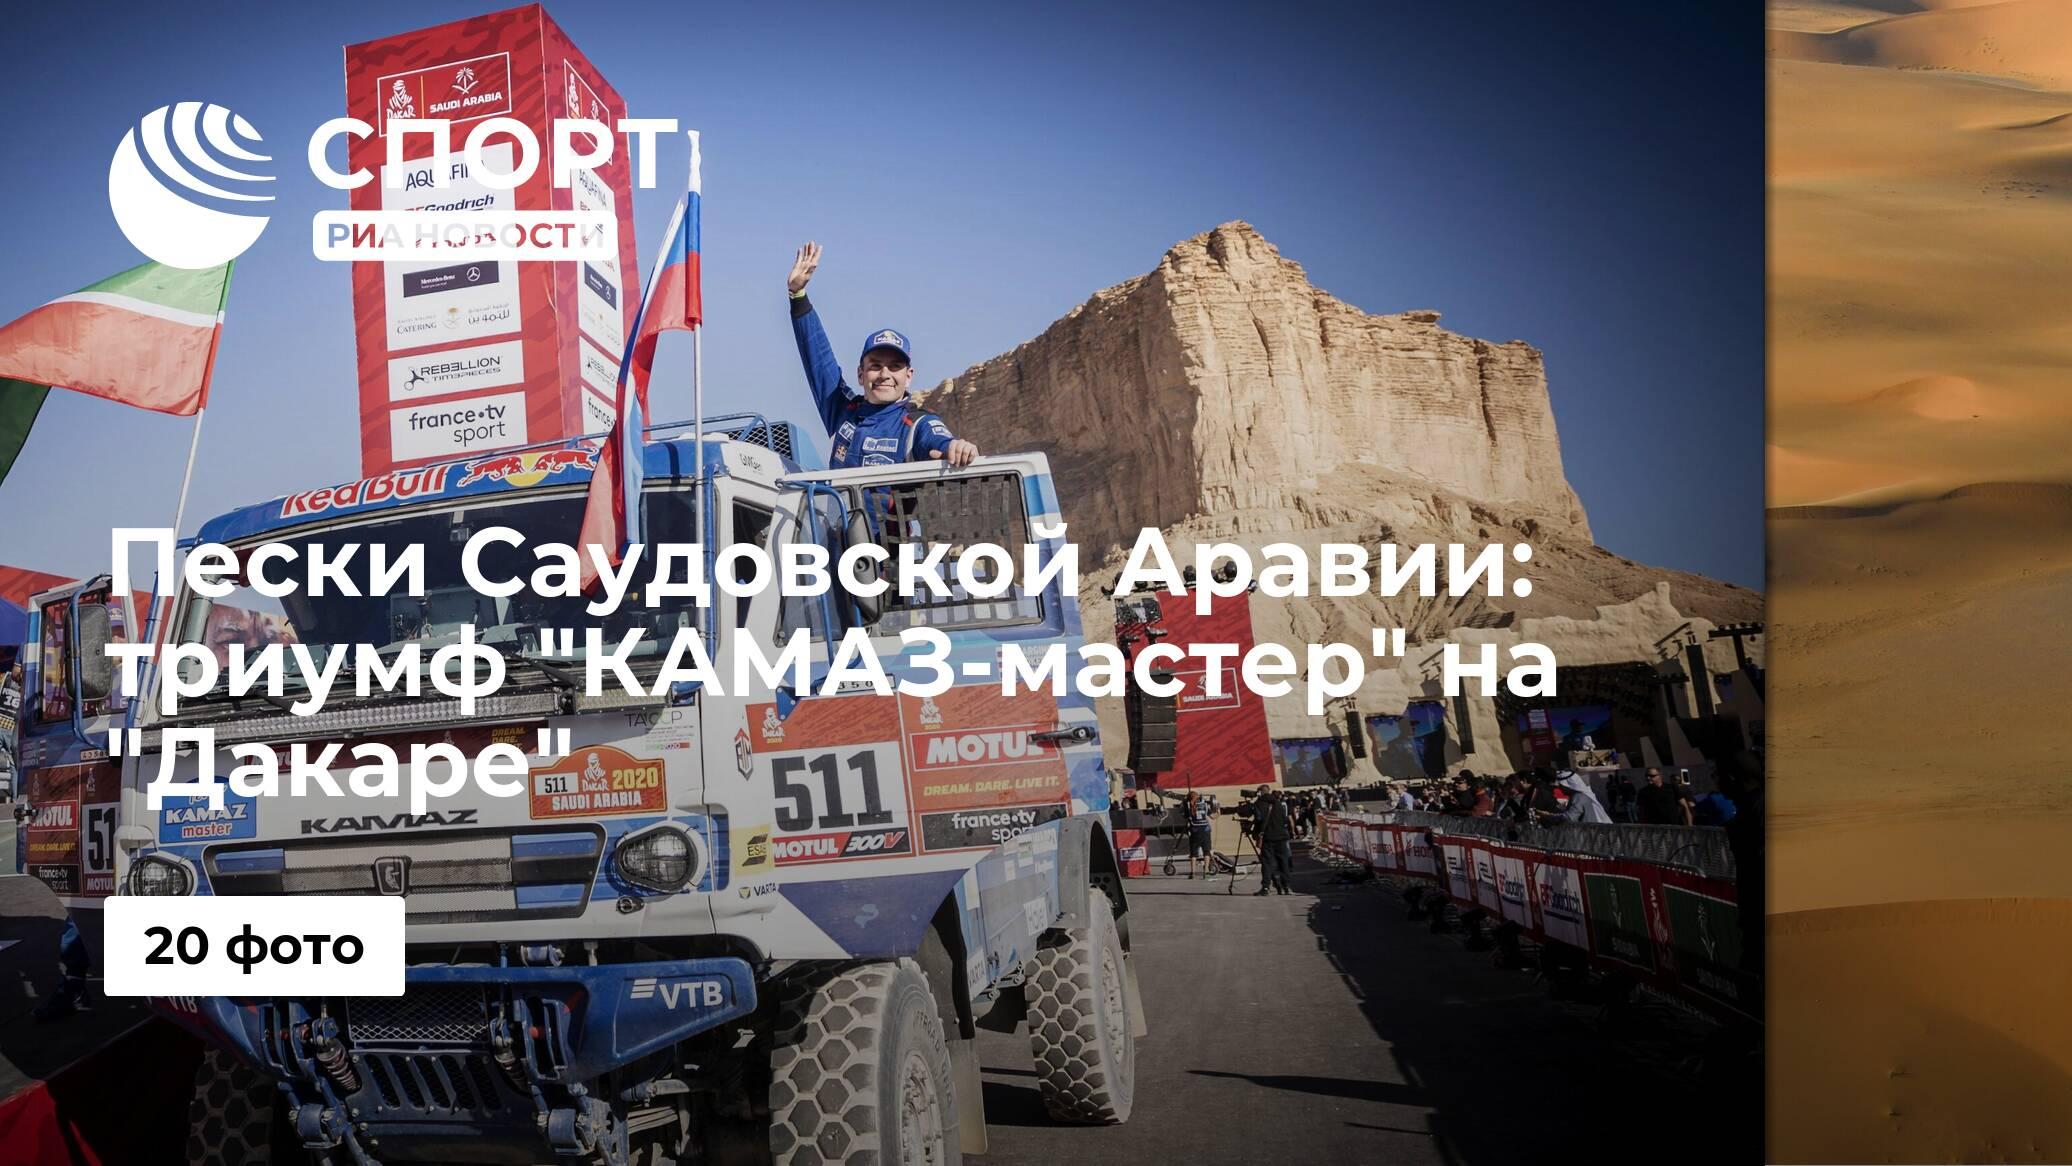 "Пески Саудовской Аравии: триумф ""КАМАЗ-мастер"" на ""Дакаре"""